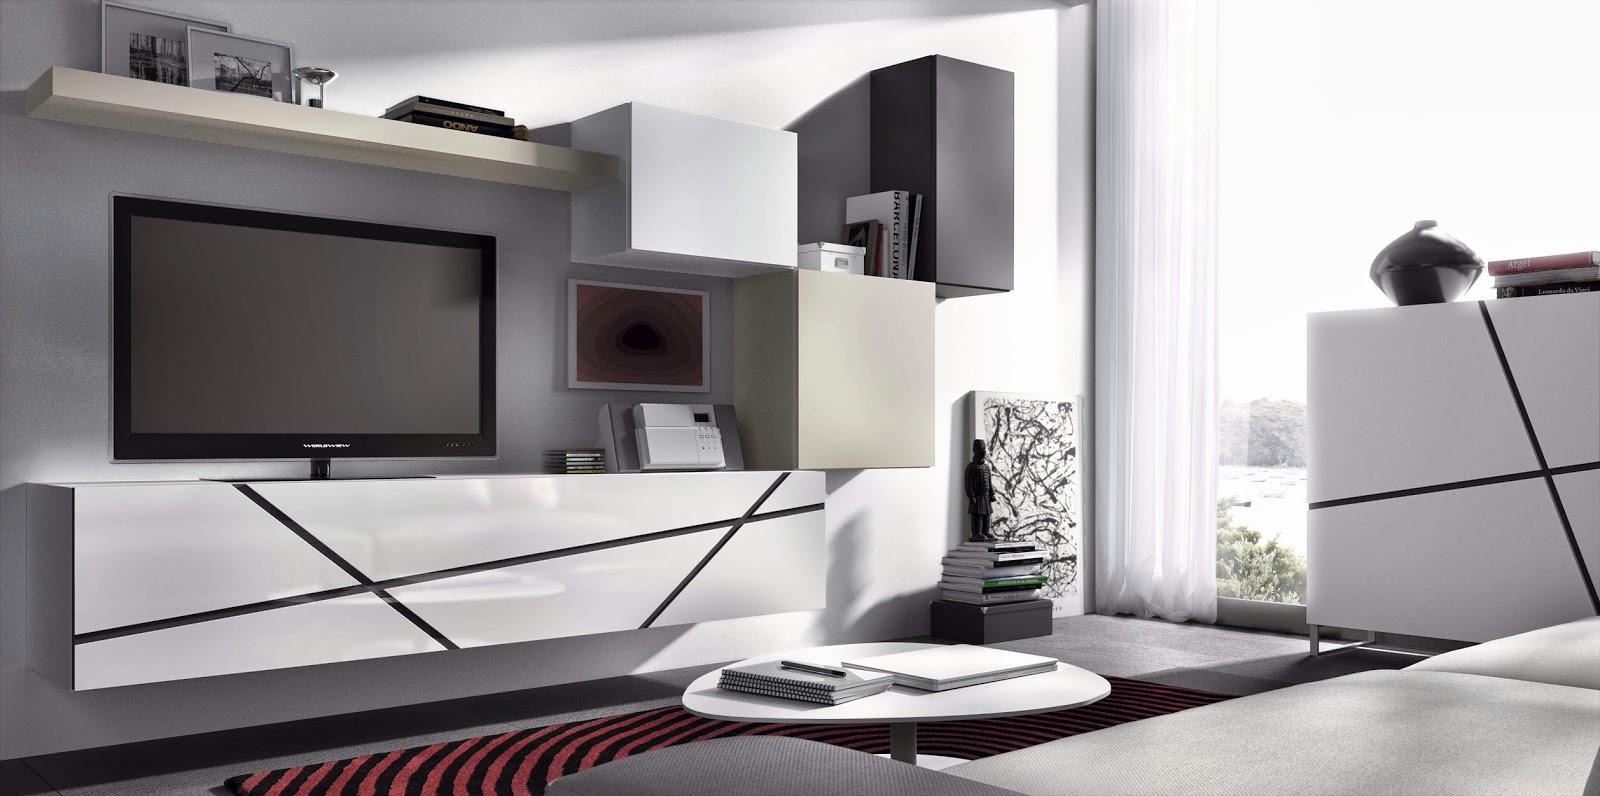 Informaci n de mobiliario opini n de producto colecci n for Muebles salon modernos